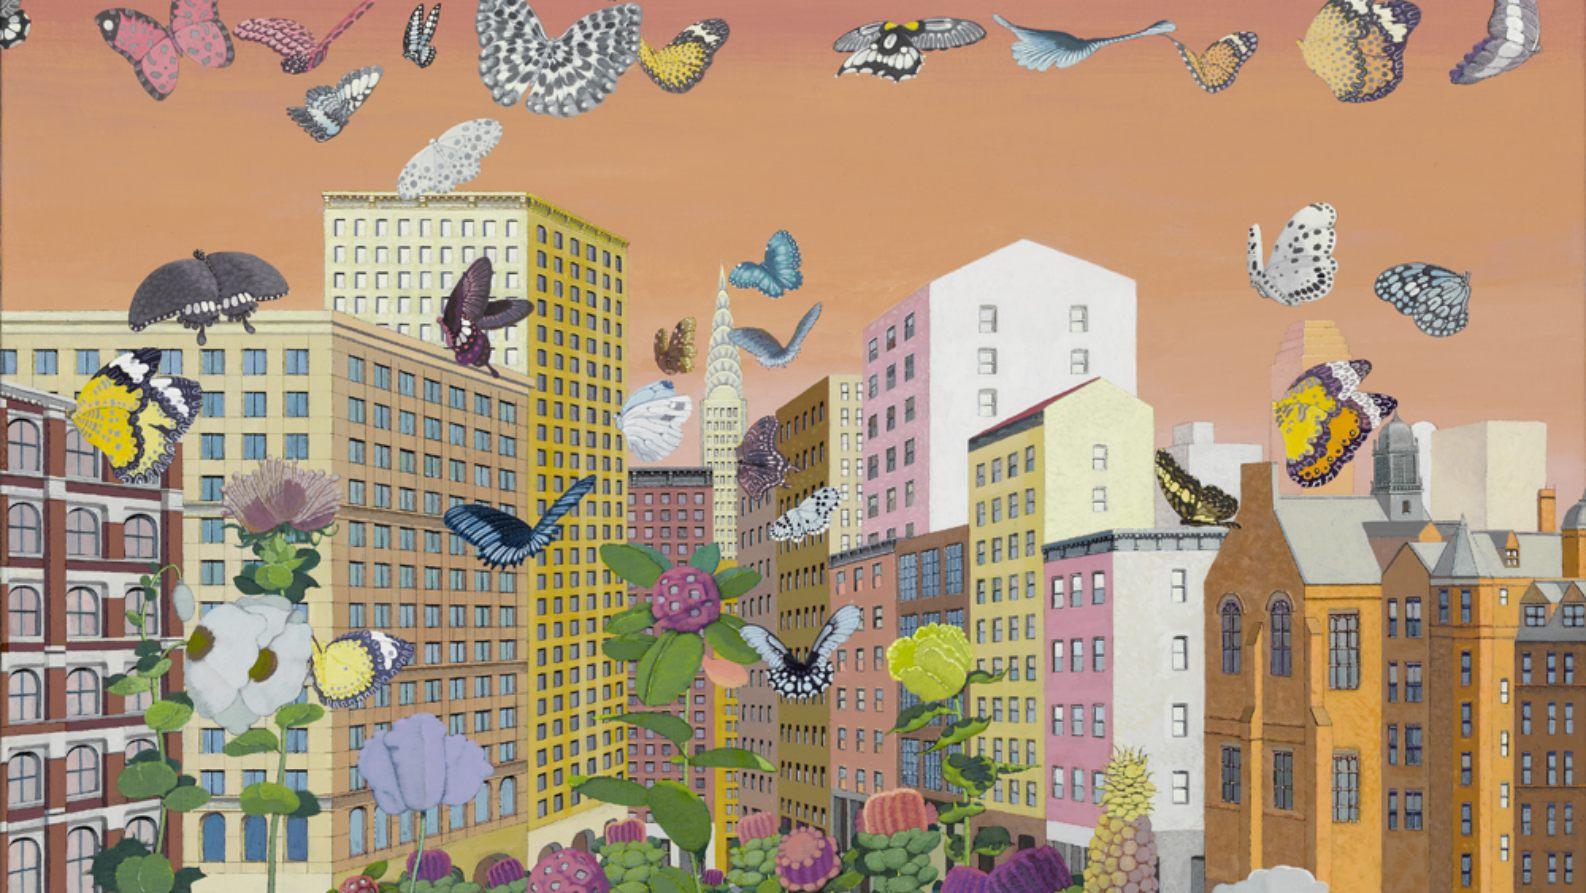 Hong Kong galleries unite to launch new art fair 'Unscheduled' in June